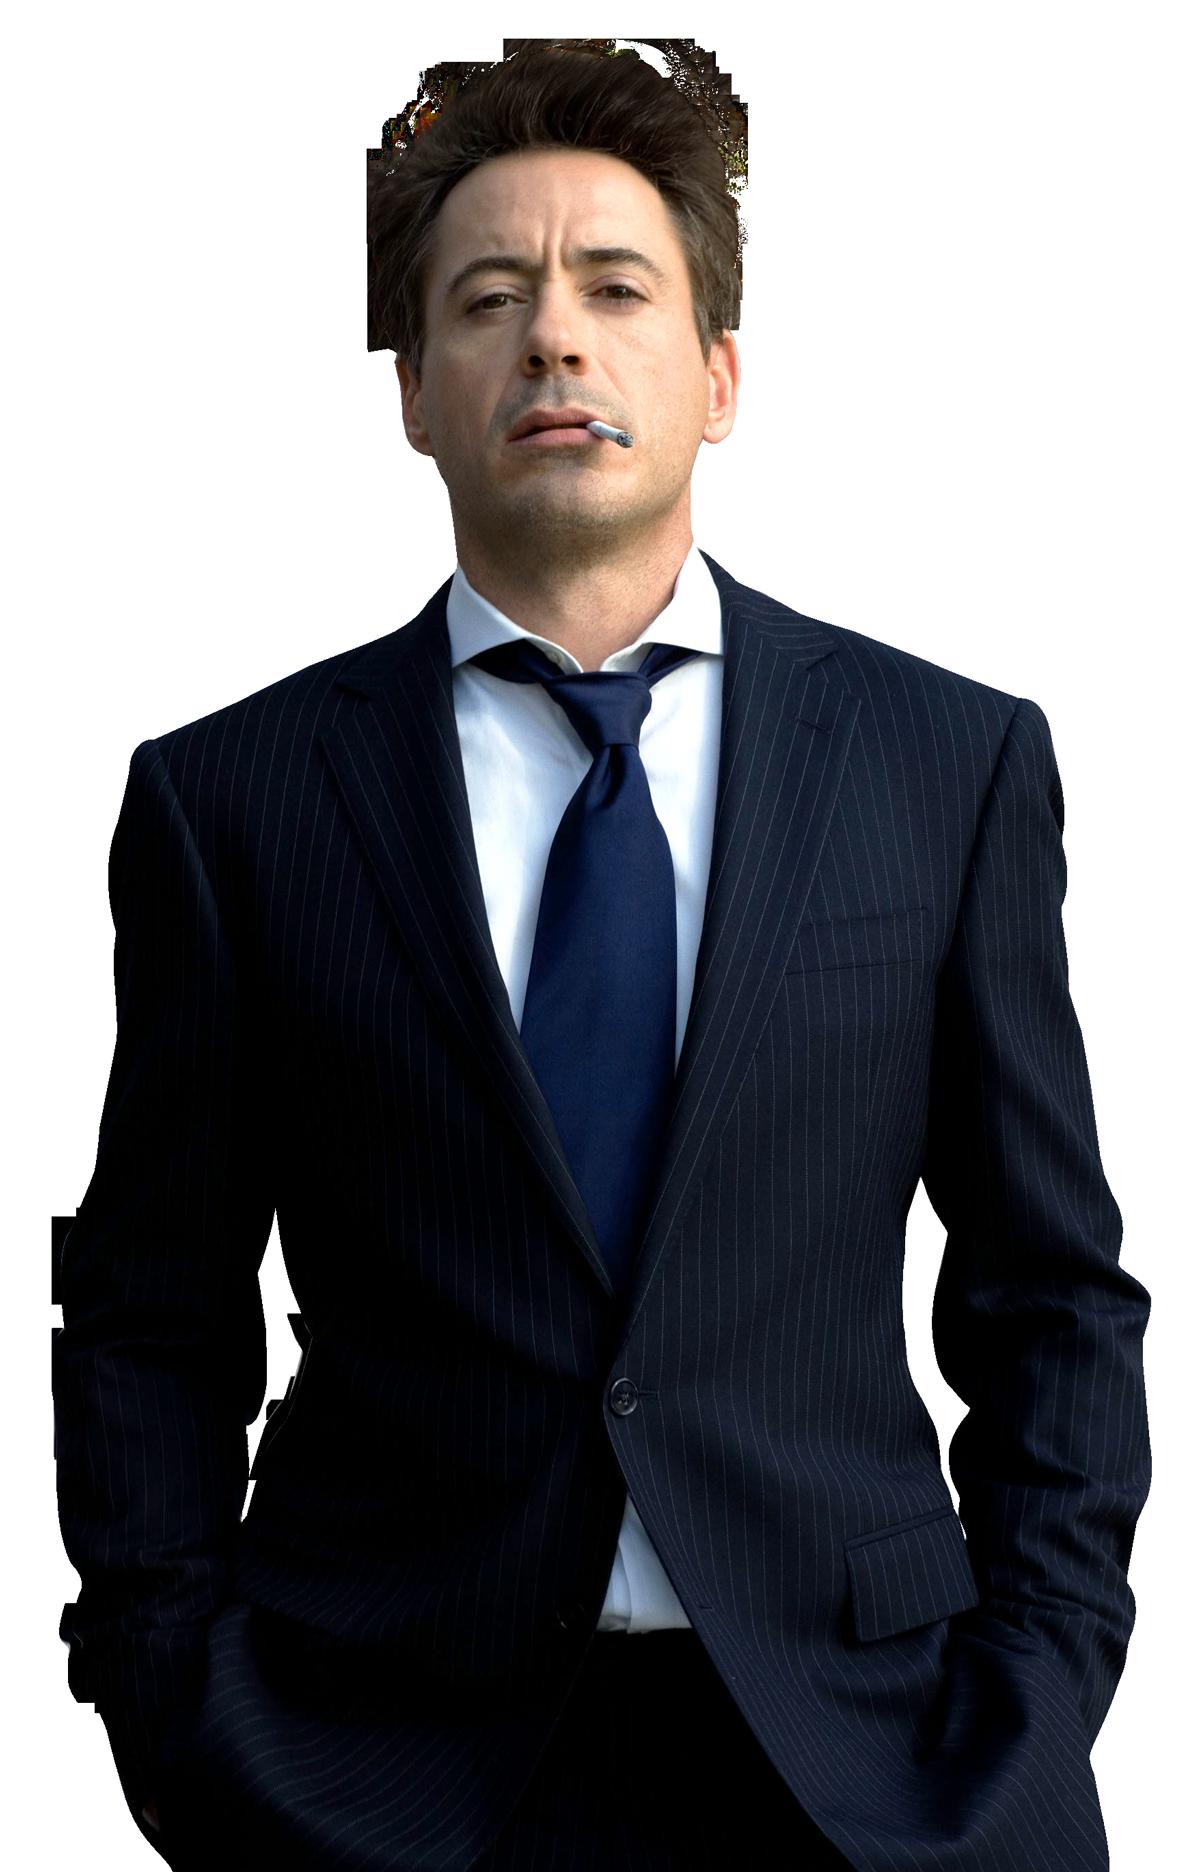 Robert Downey Jr PNG Transparent Image - Tom Cruise PNG